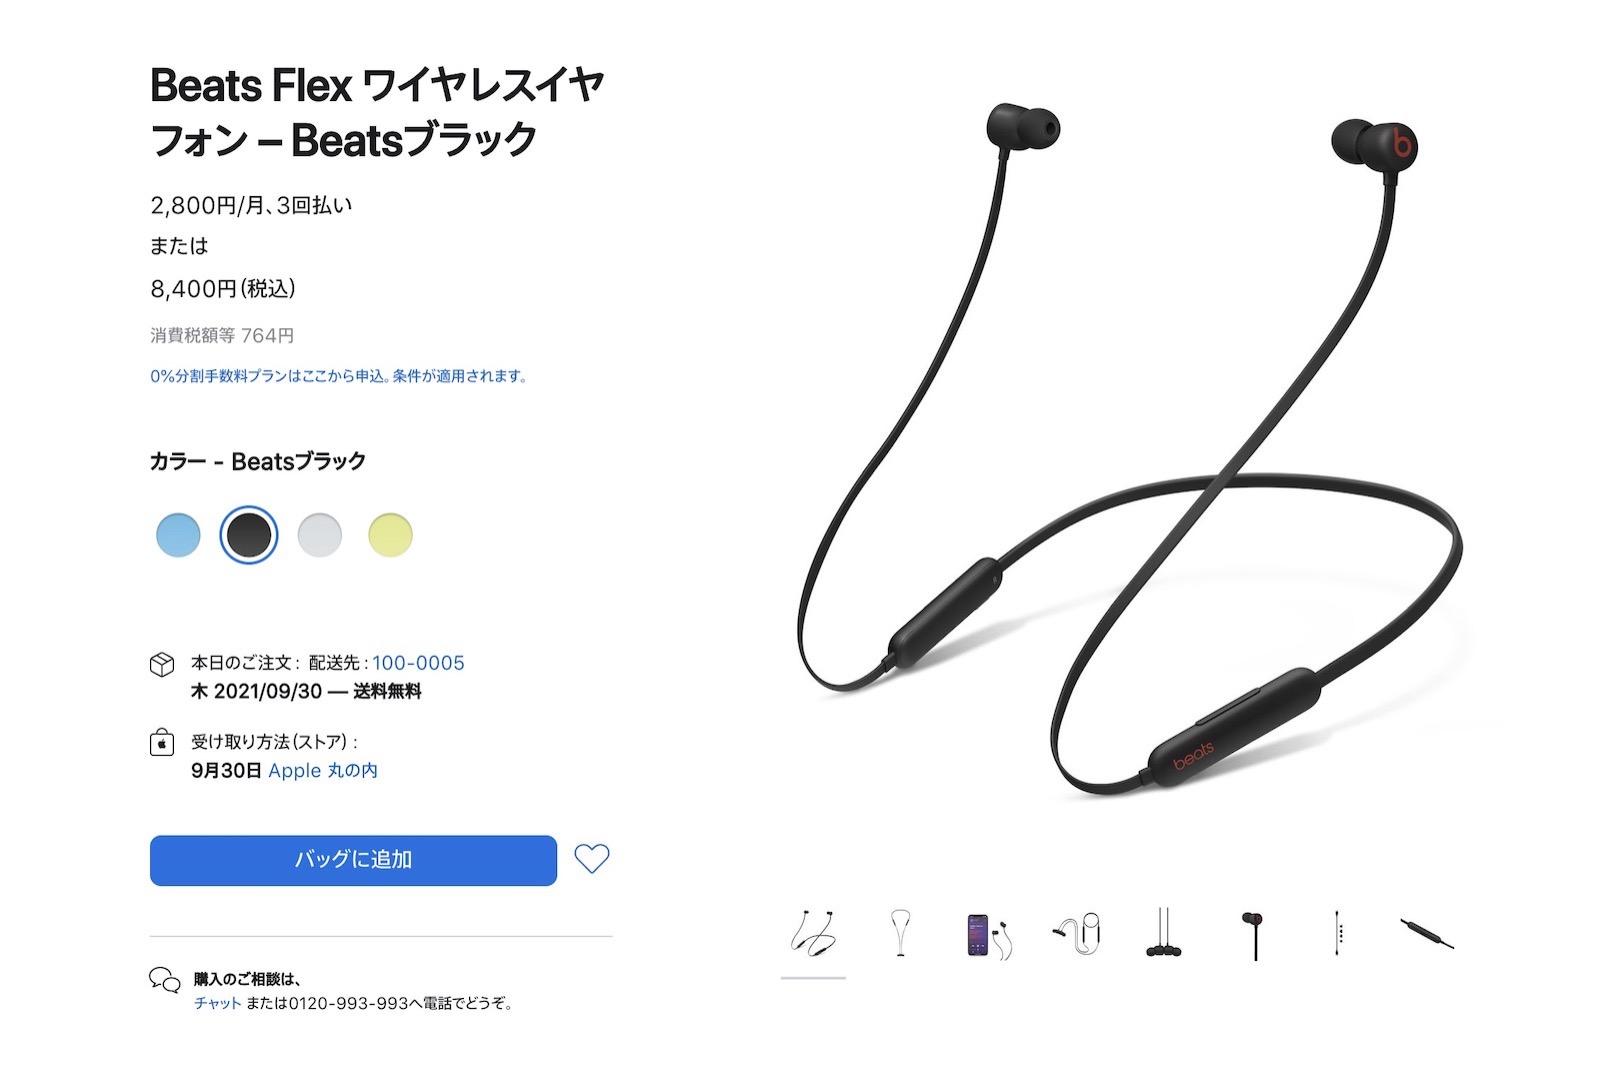 Beats Flex price raise